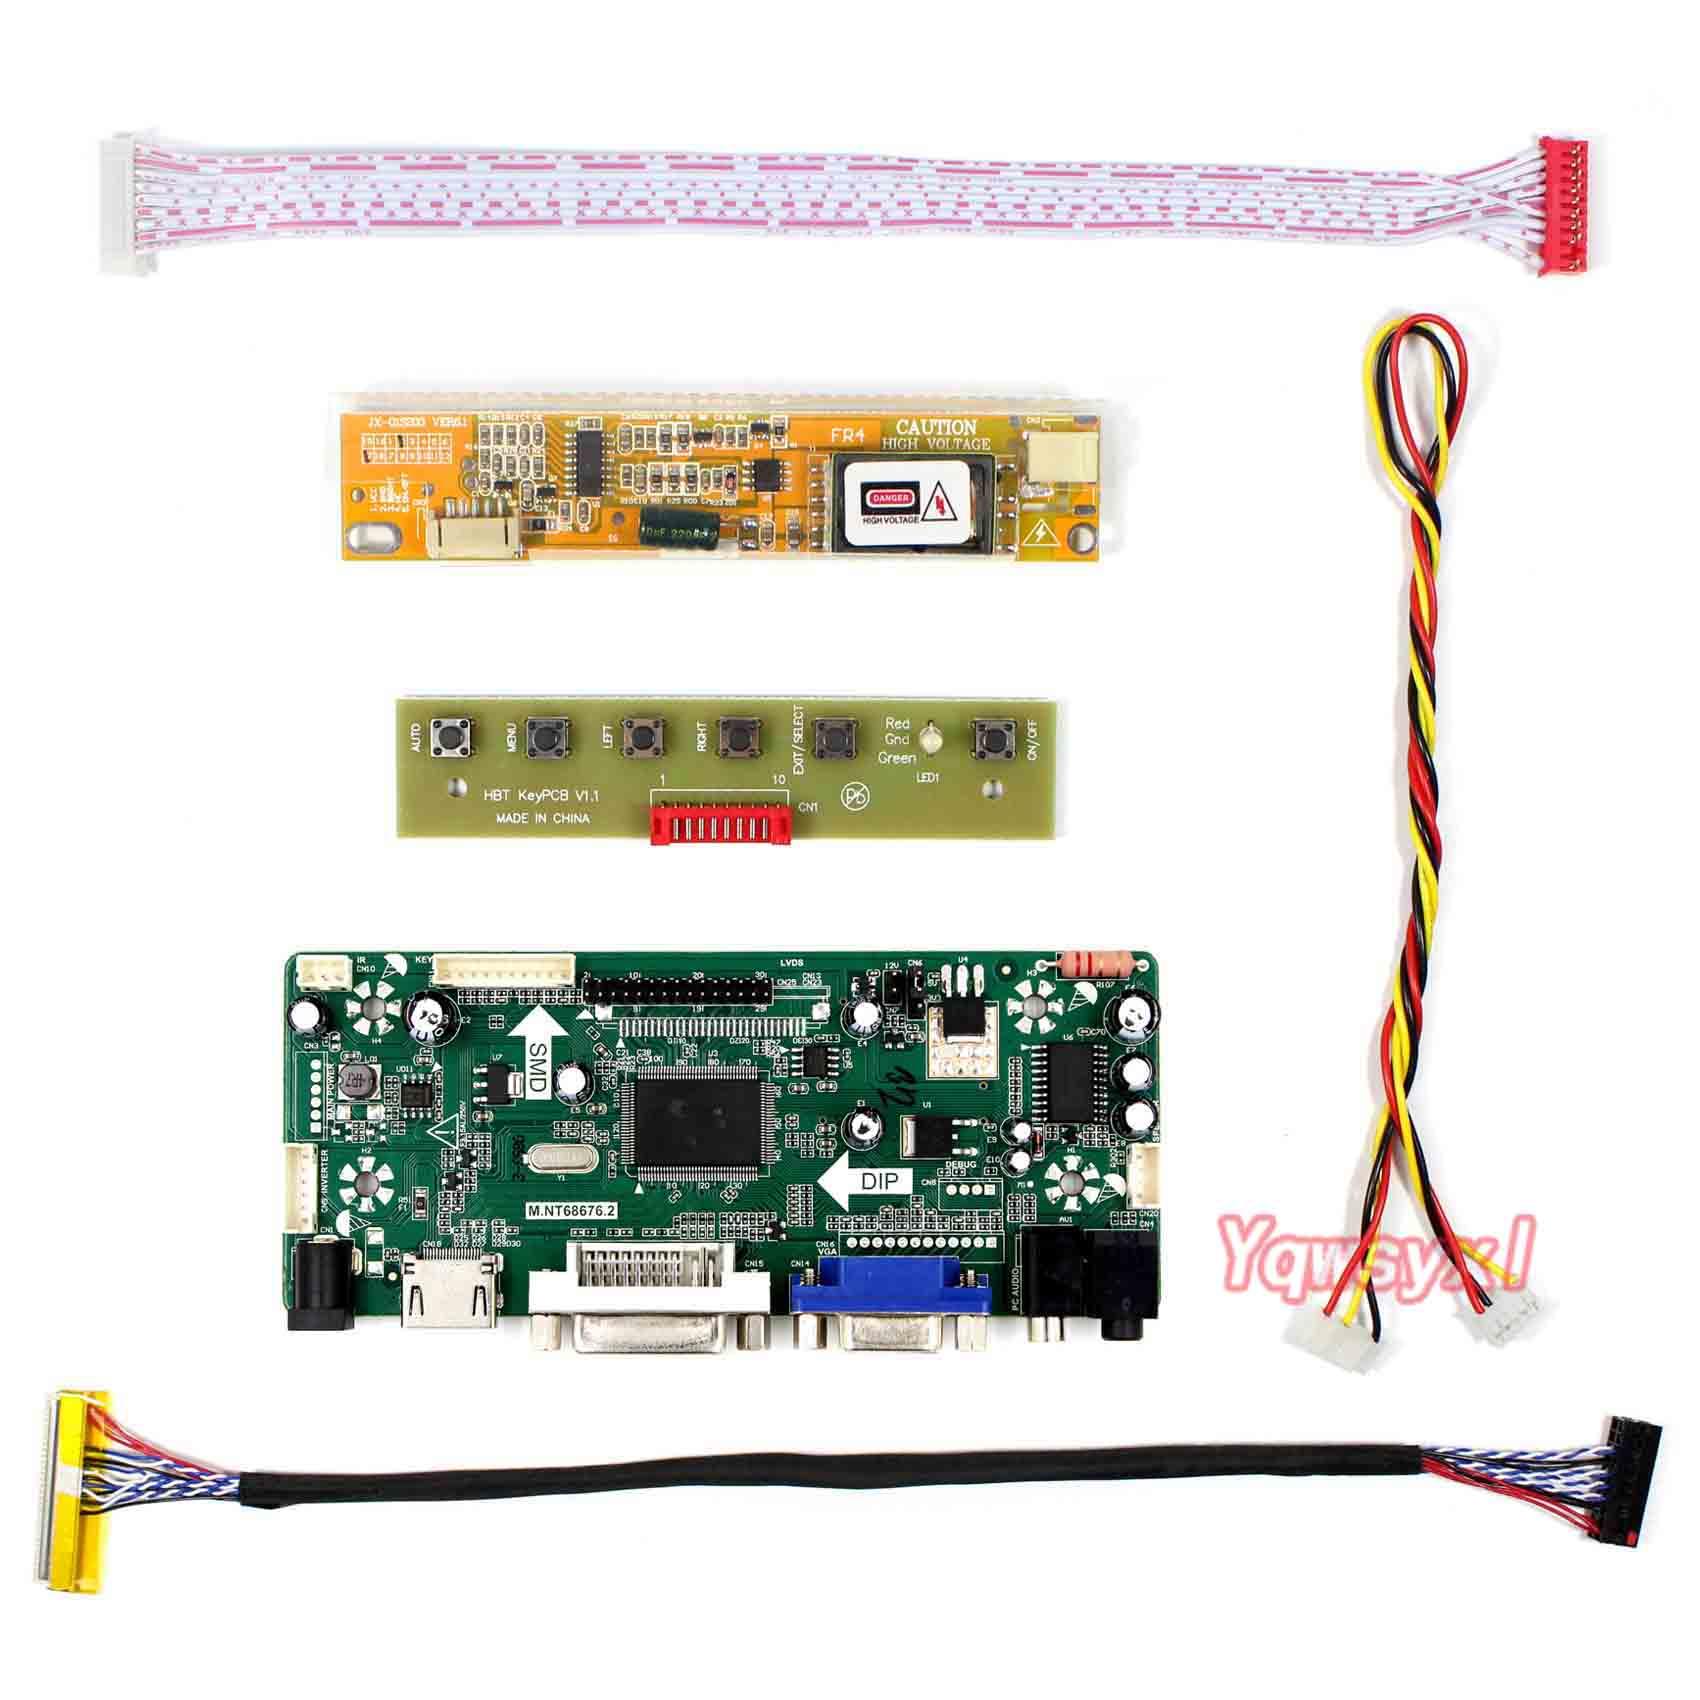 Yqwsyxl Control Board Monitor Kit For LP156WH1(TL)(A3)  LP156WH1-TLA3 HDMI + DVI + VGA LCD LED Screen Controller Board Driver